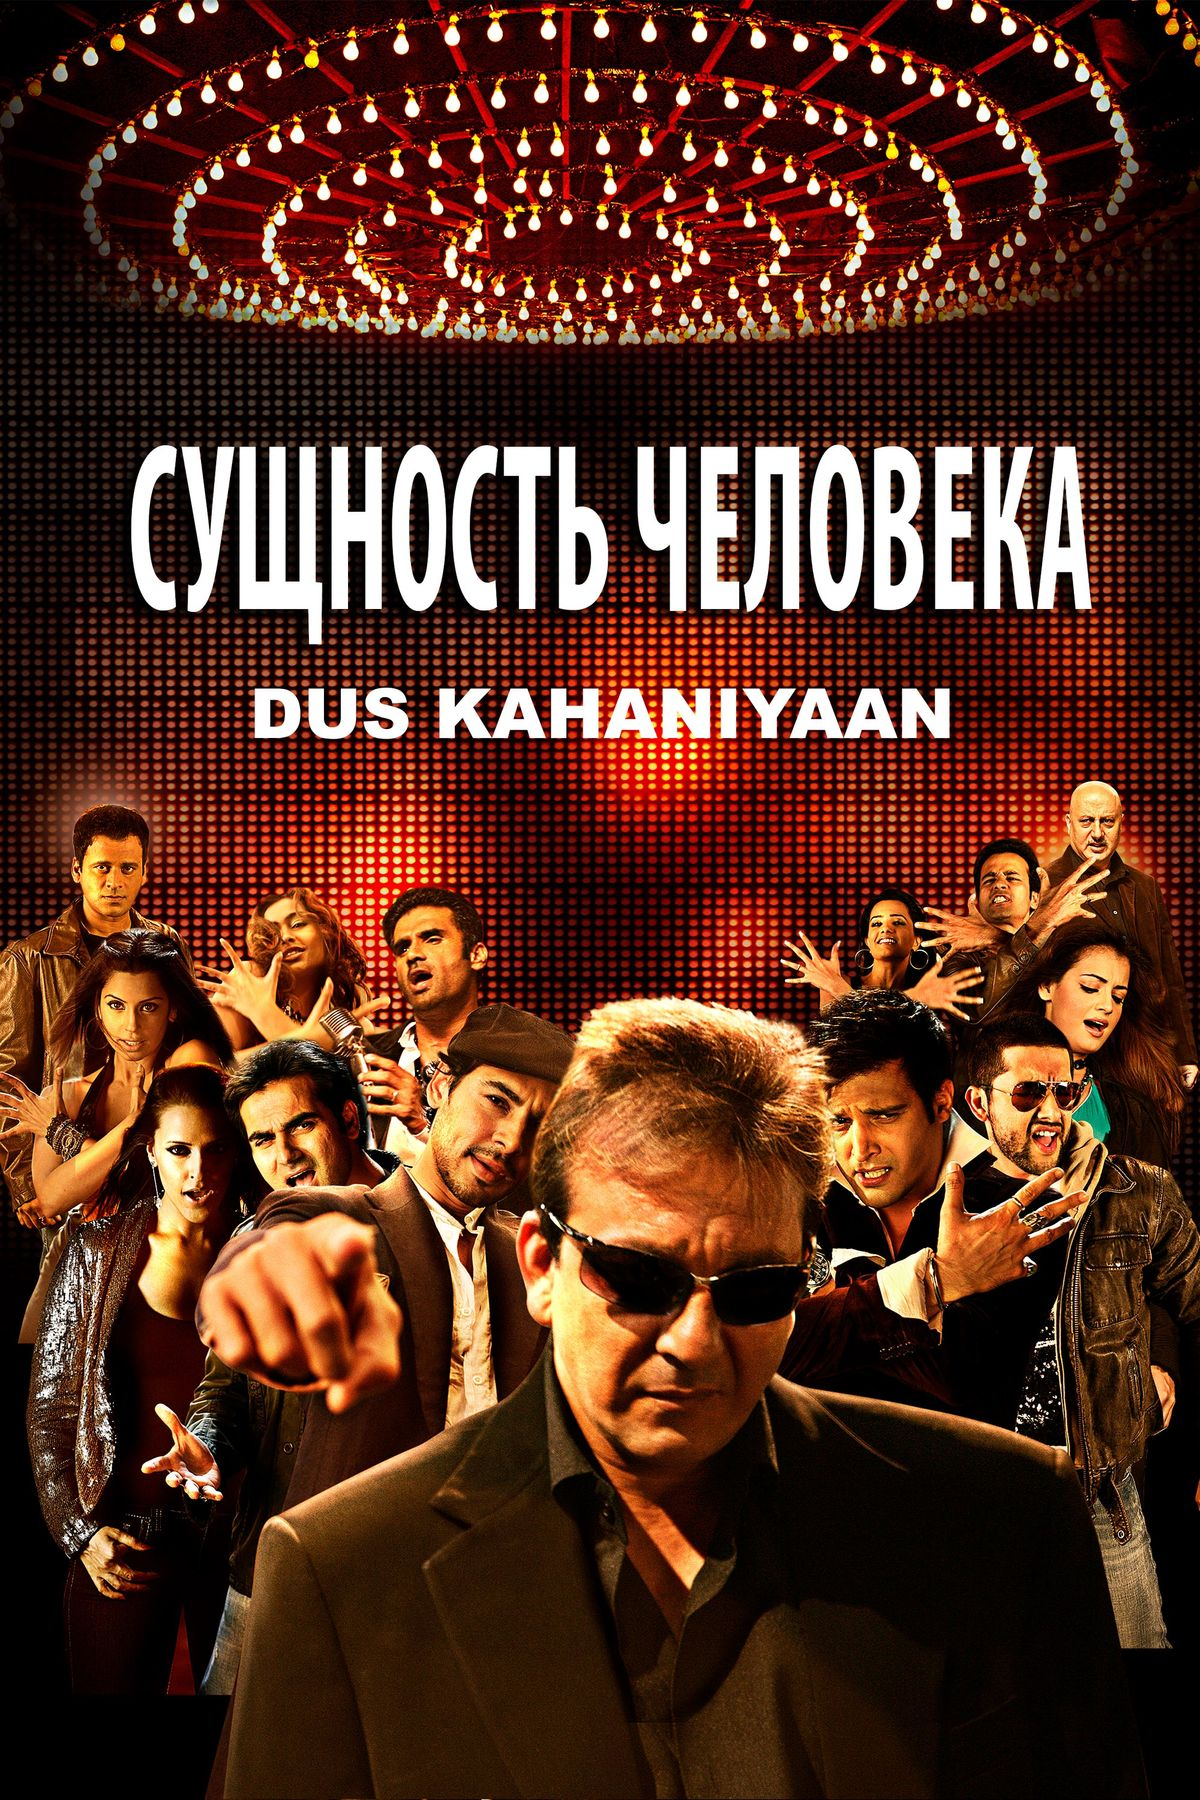 Dus Kahaniyaan - Russian